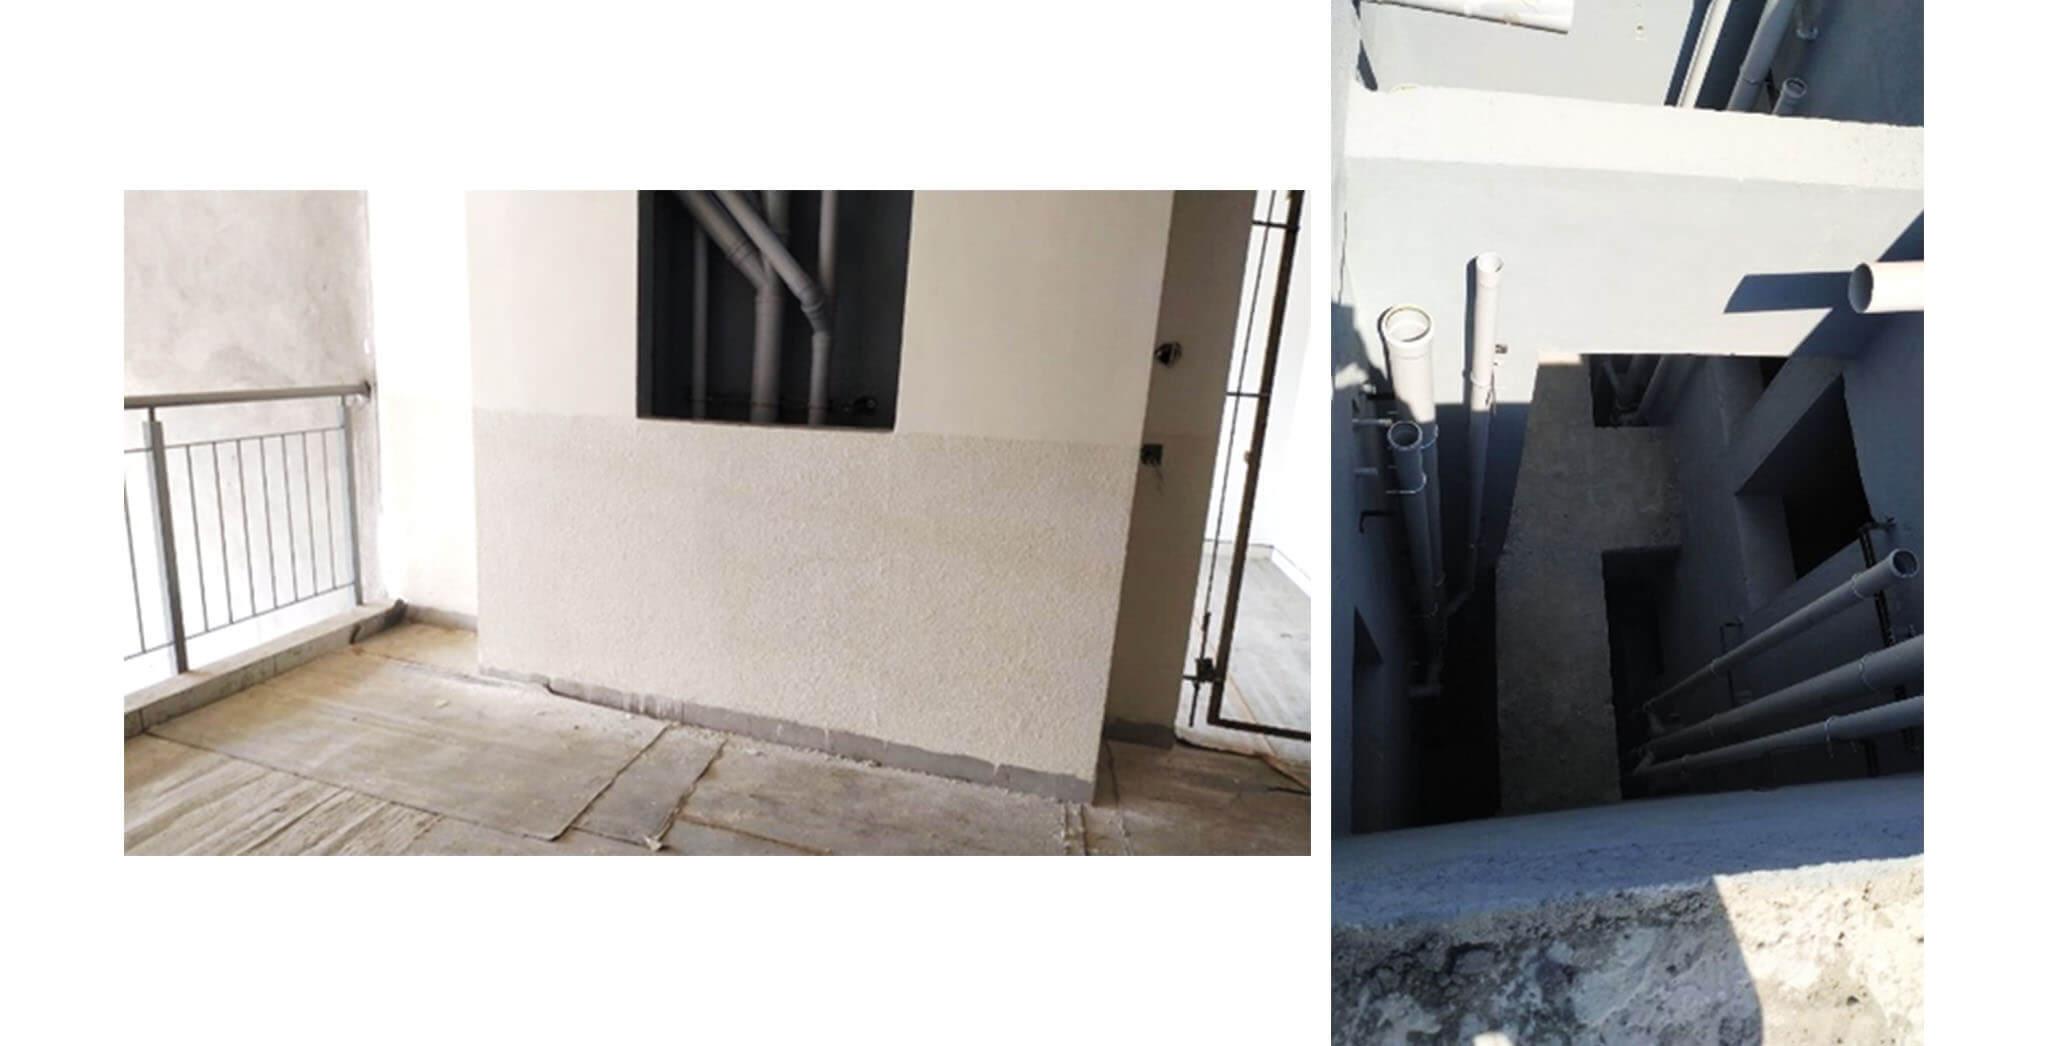 Dec 2020 - K Block: Lobby painting and flooring, Shaft piping work-in-progress.